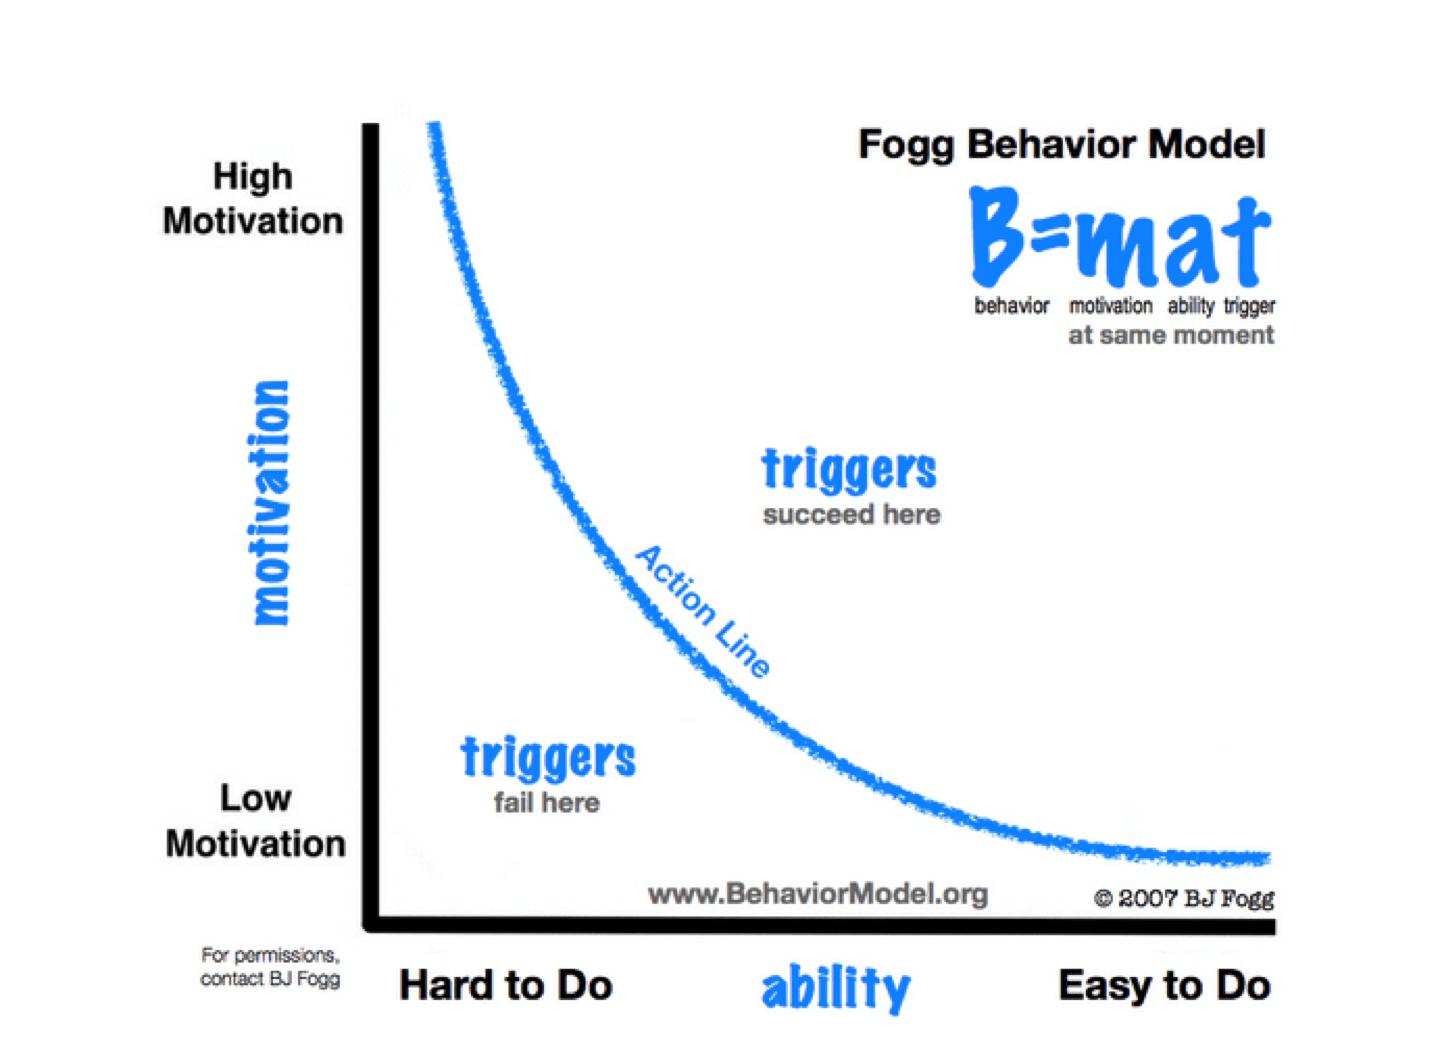 Copywriting: Fogg Model Graph